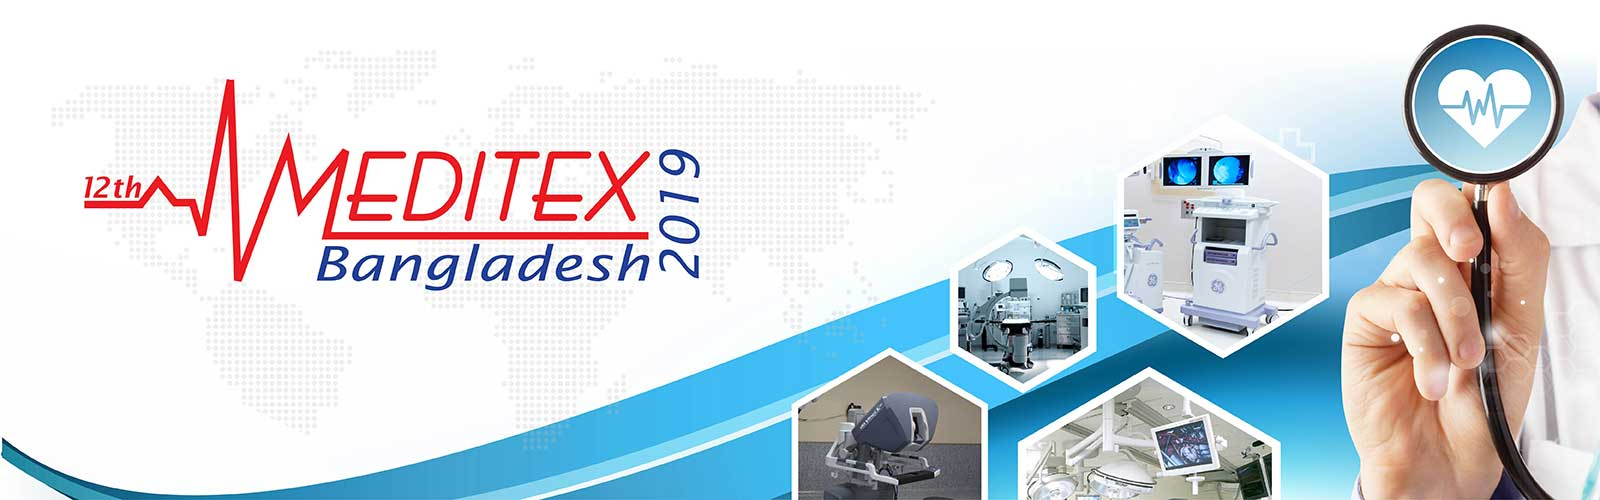 Meditex 2013 Phone Number